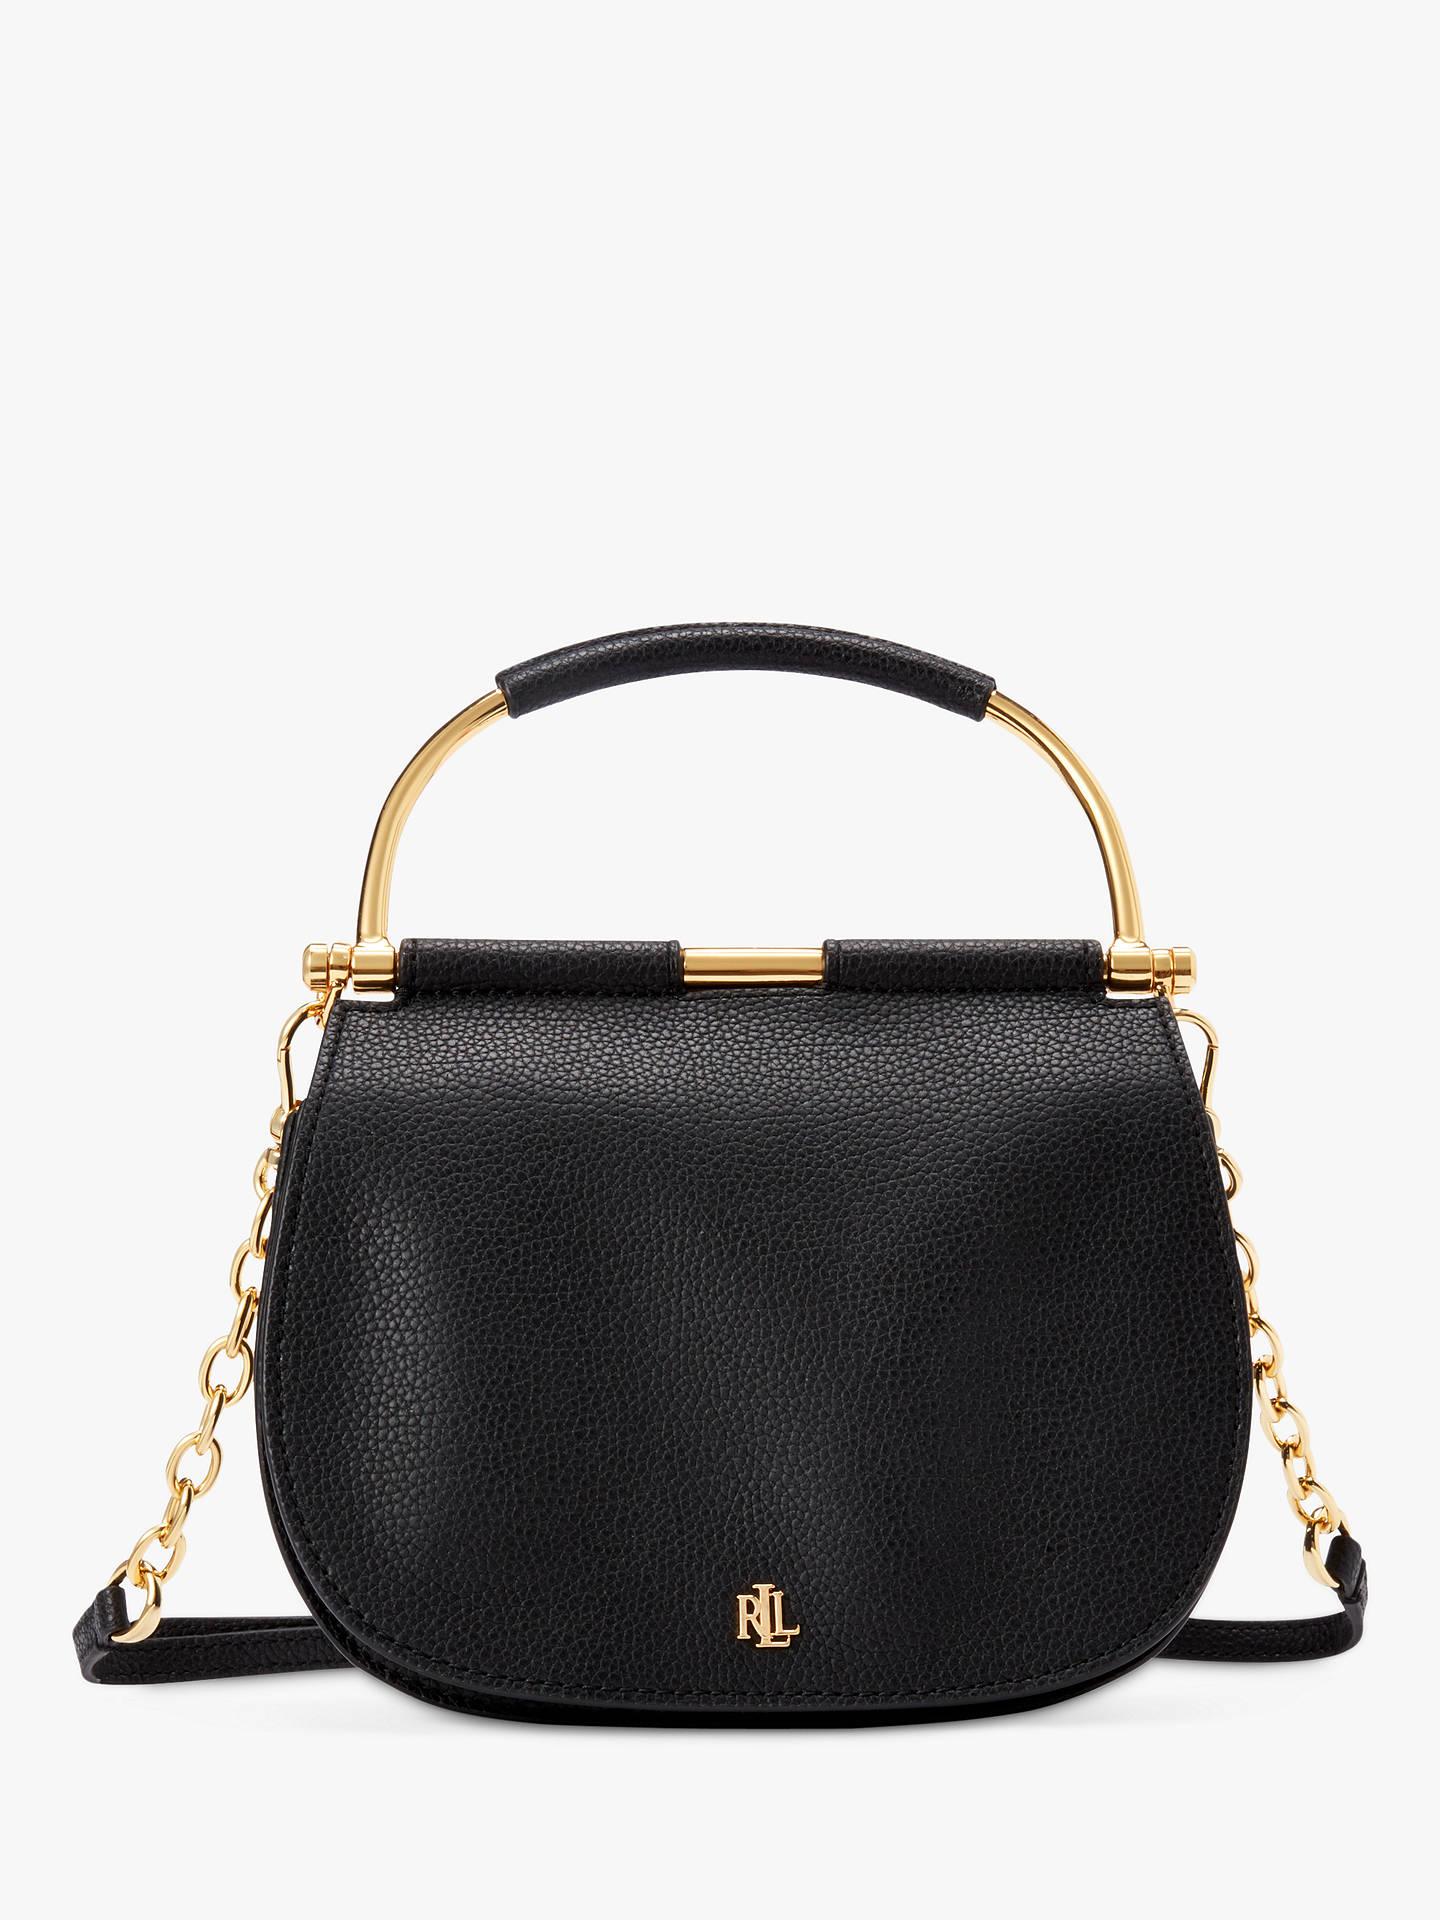 1f4295e128dcd Buy Lauren Ralph Lauren Enfield Mason 20 Leather Satchel